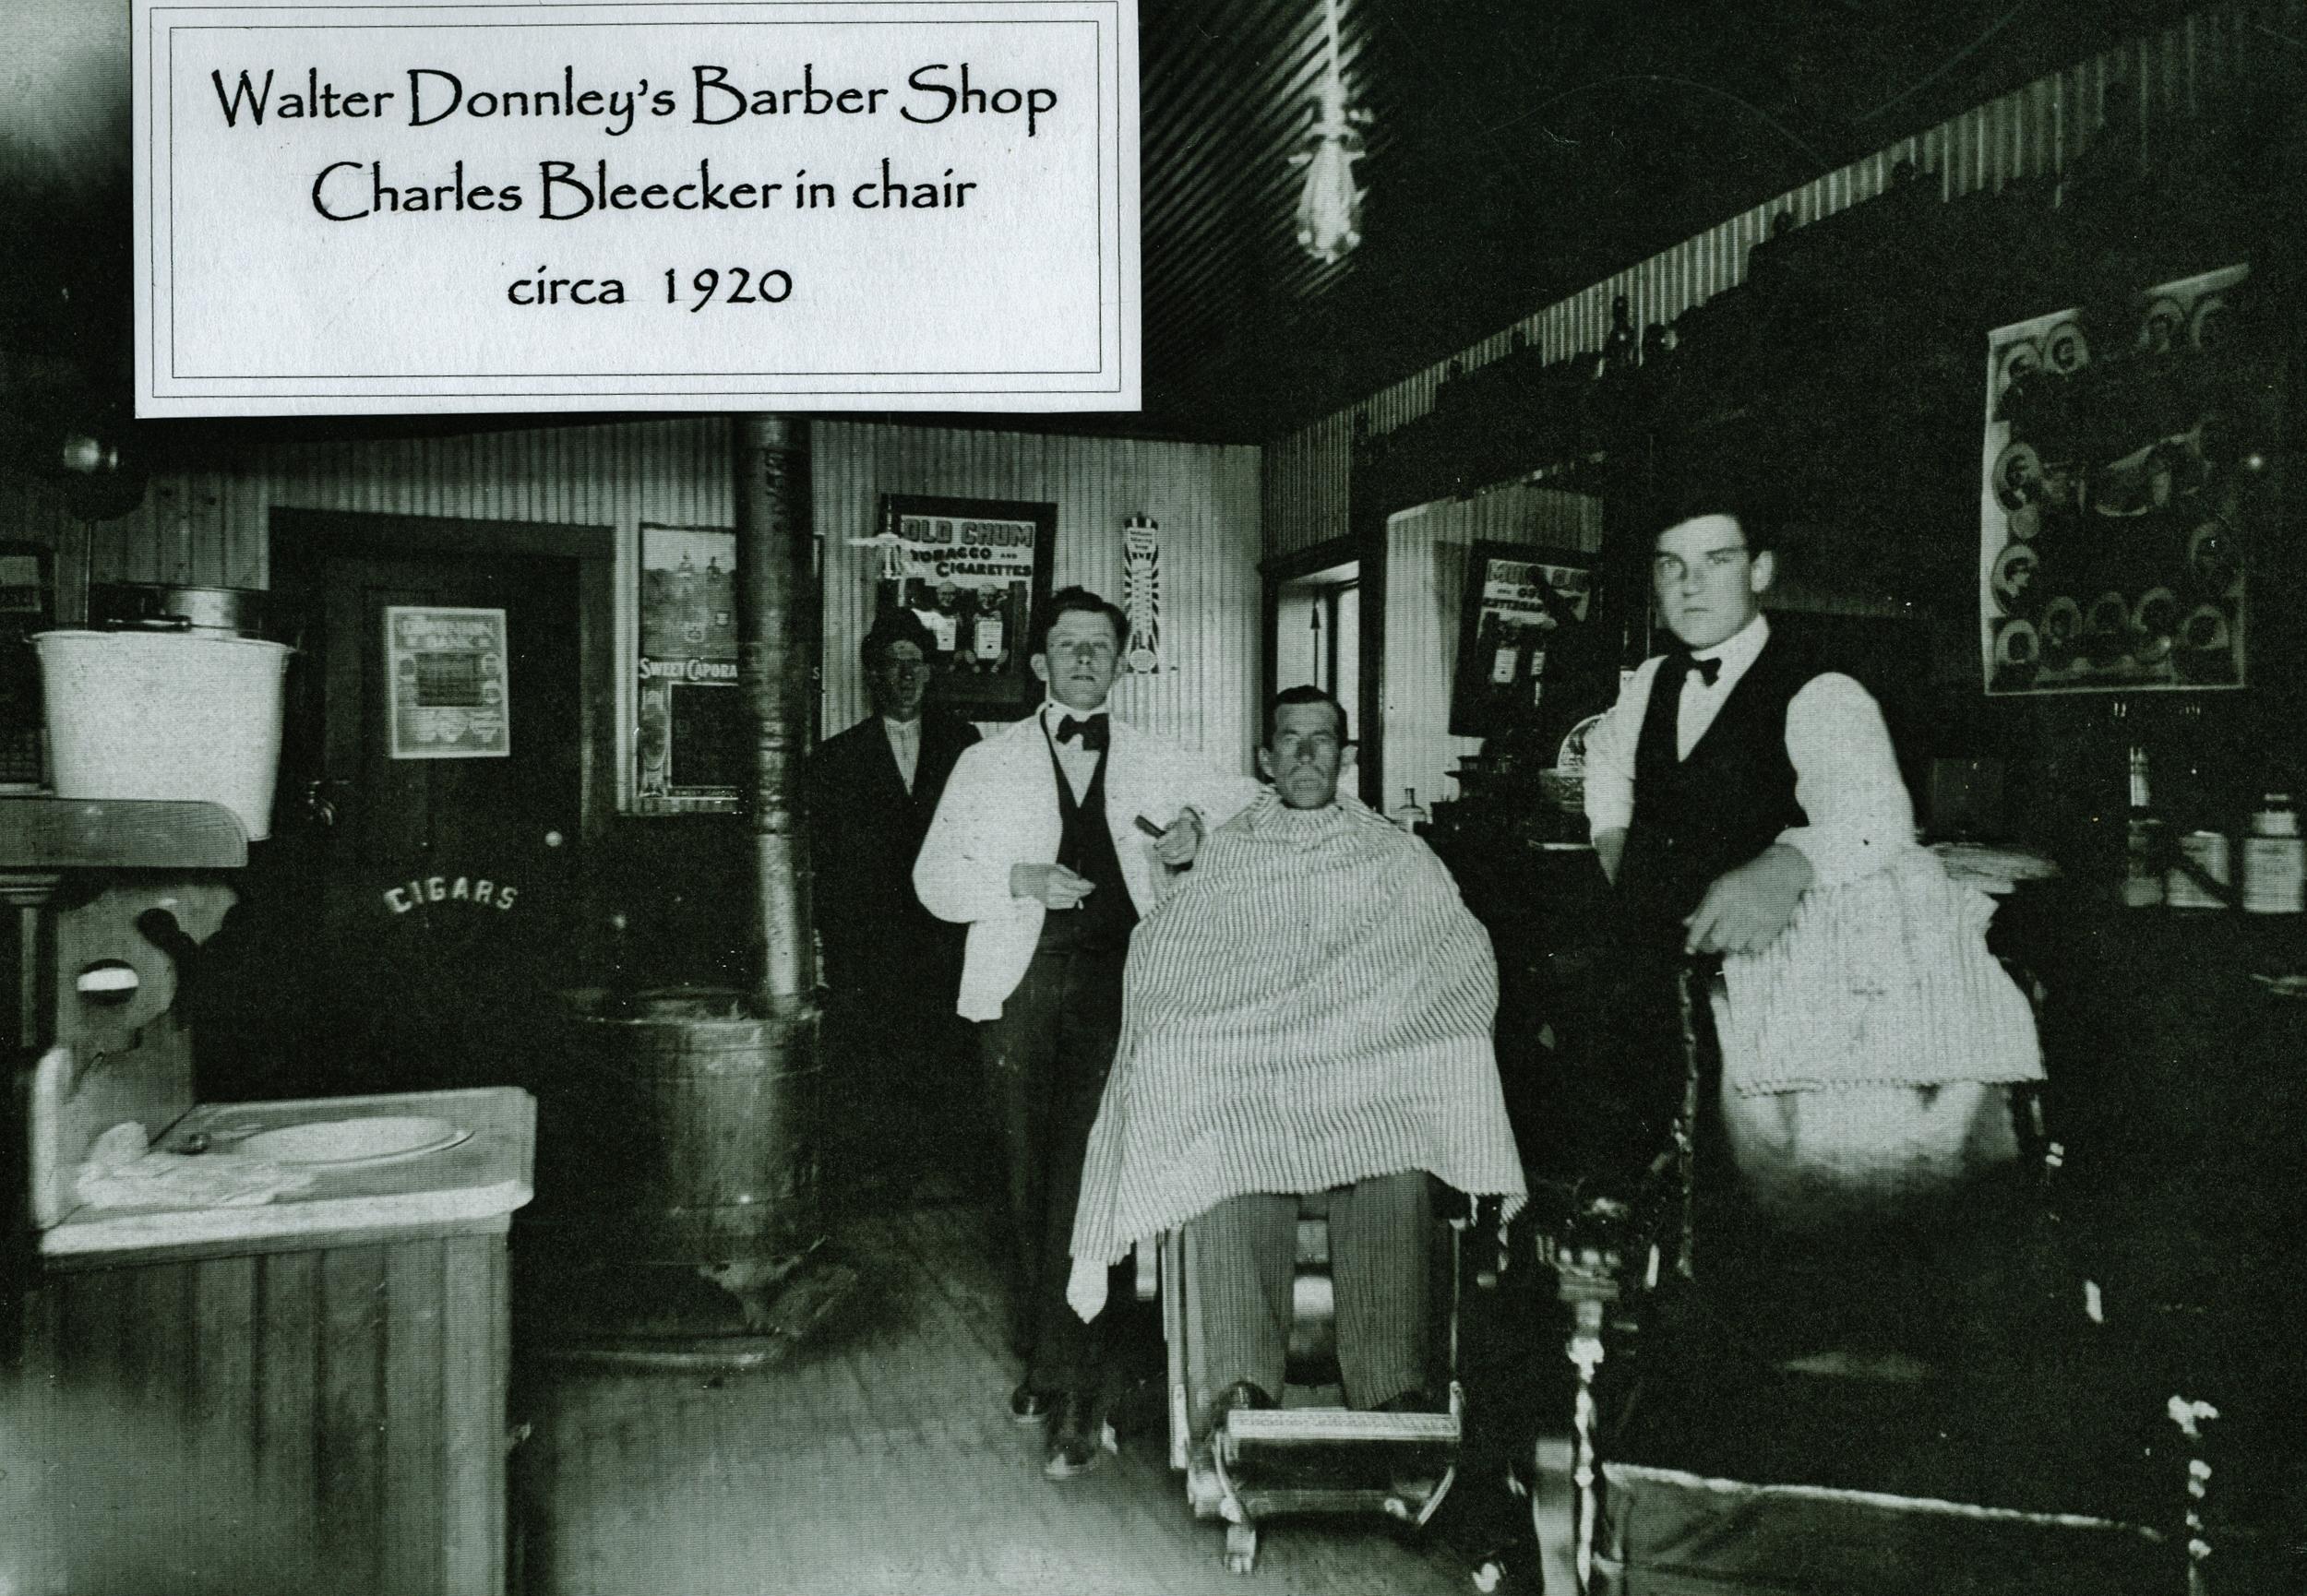 Walter Donnley's Barber Sbop, Charles Bleecker in chair c. 1920